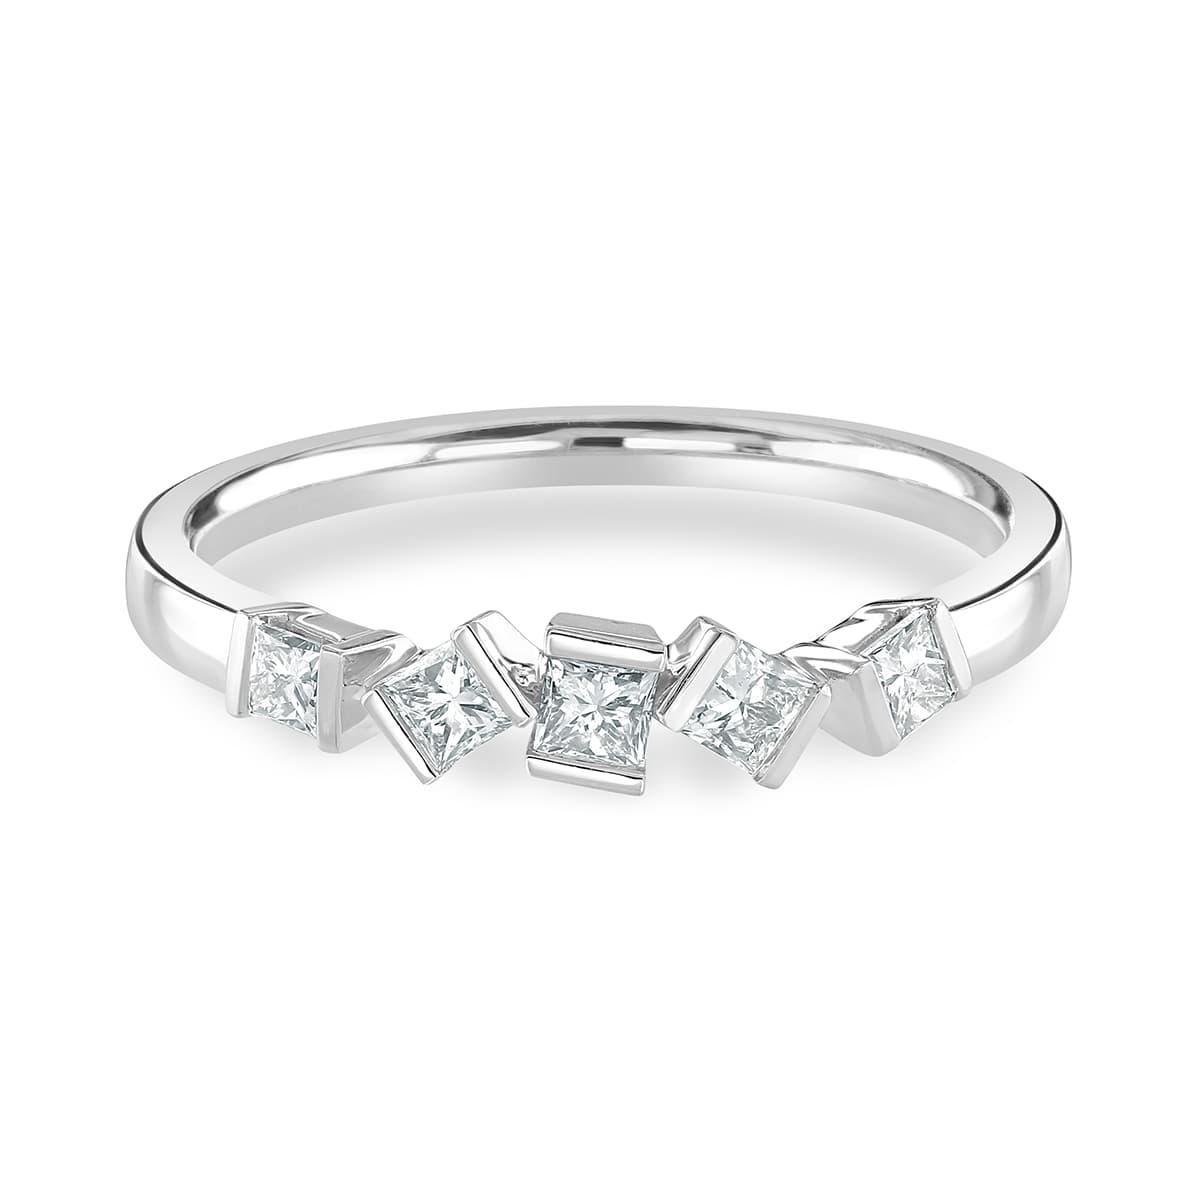 Hopscotch White Gold Diamond Stacking Ring